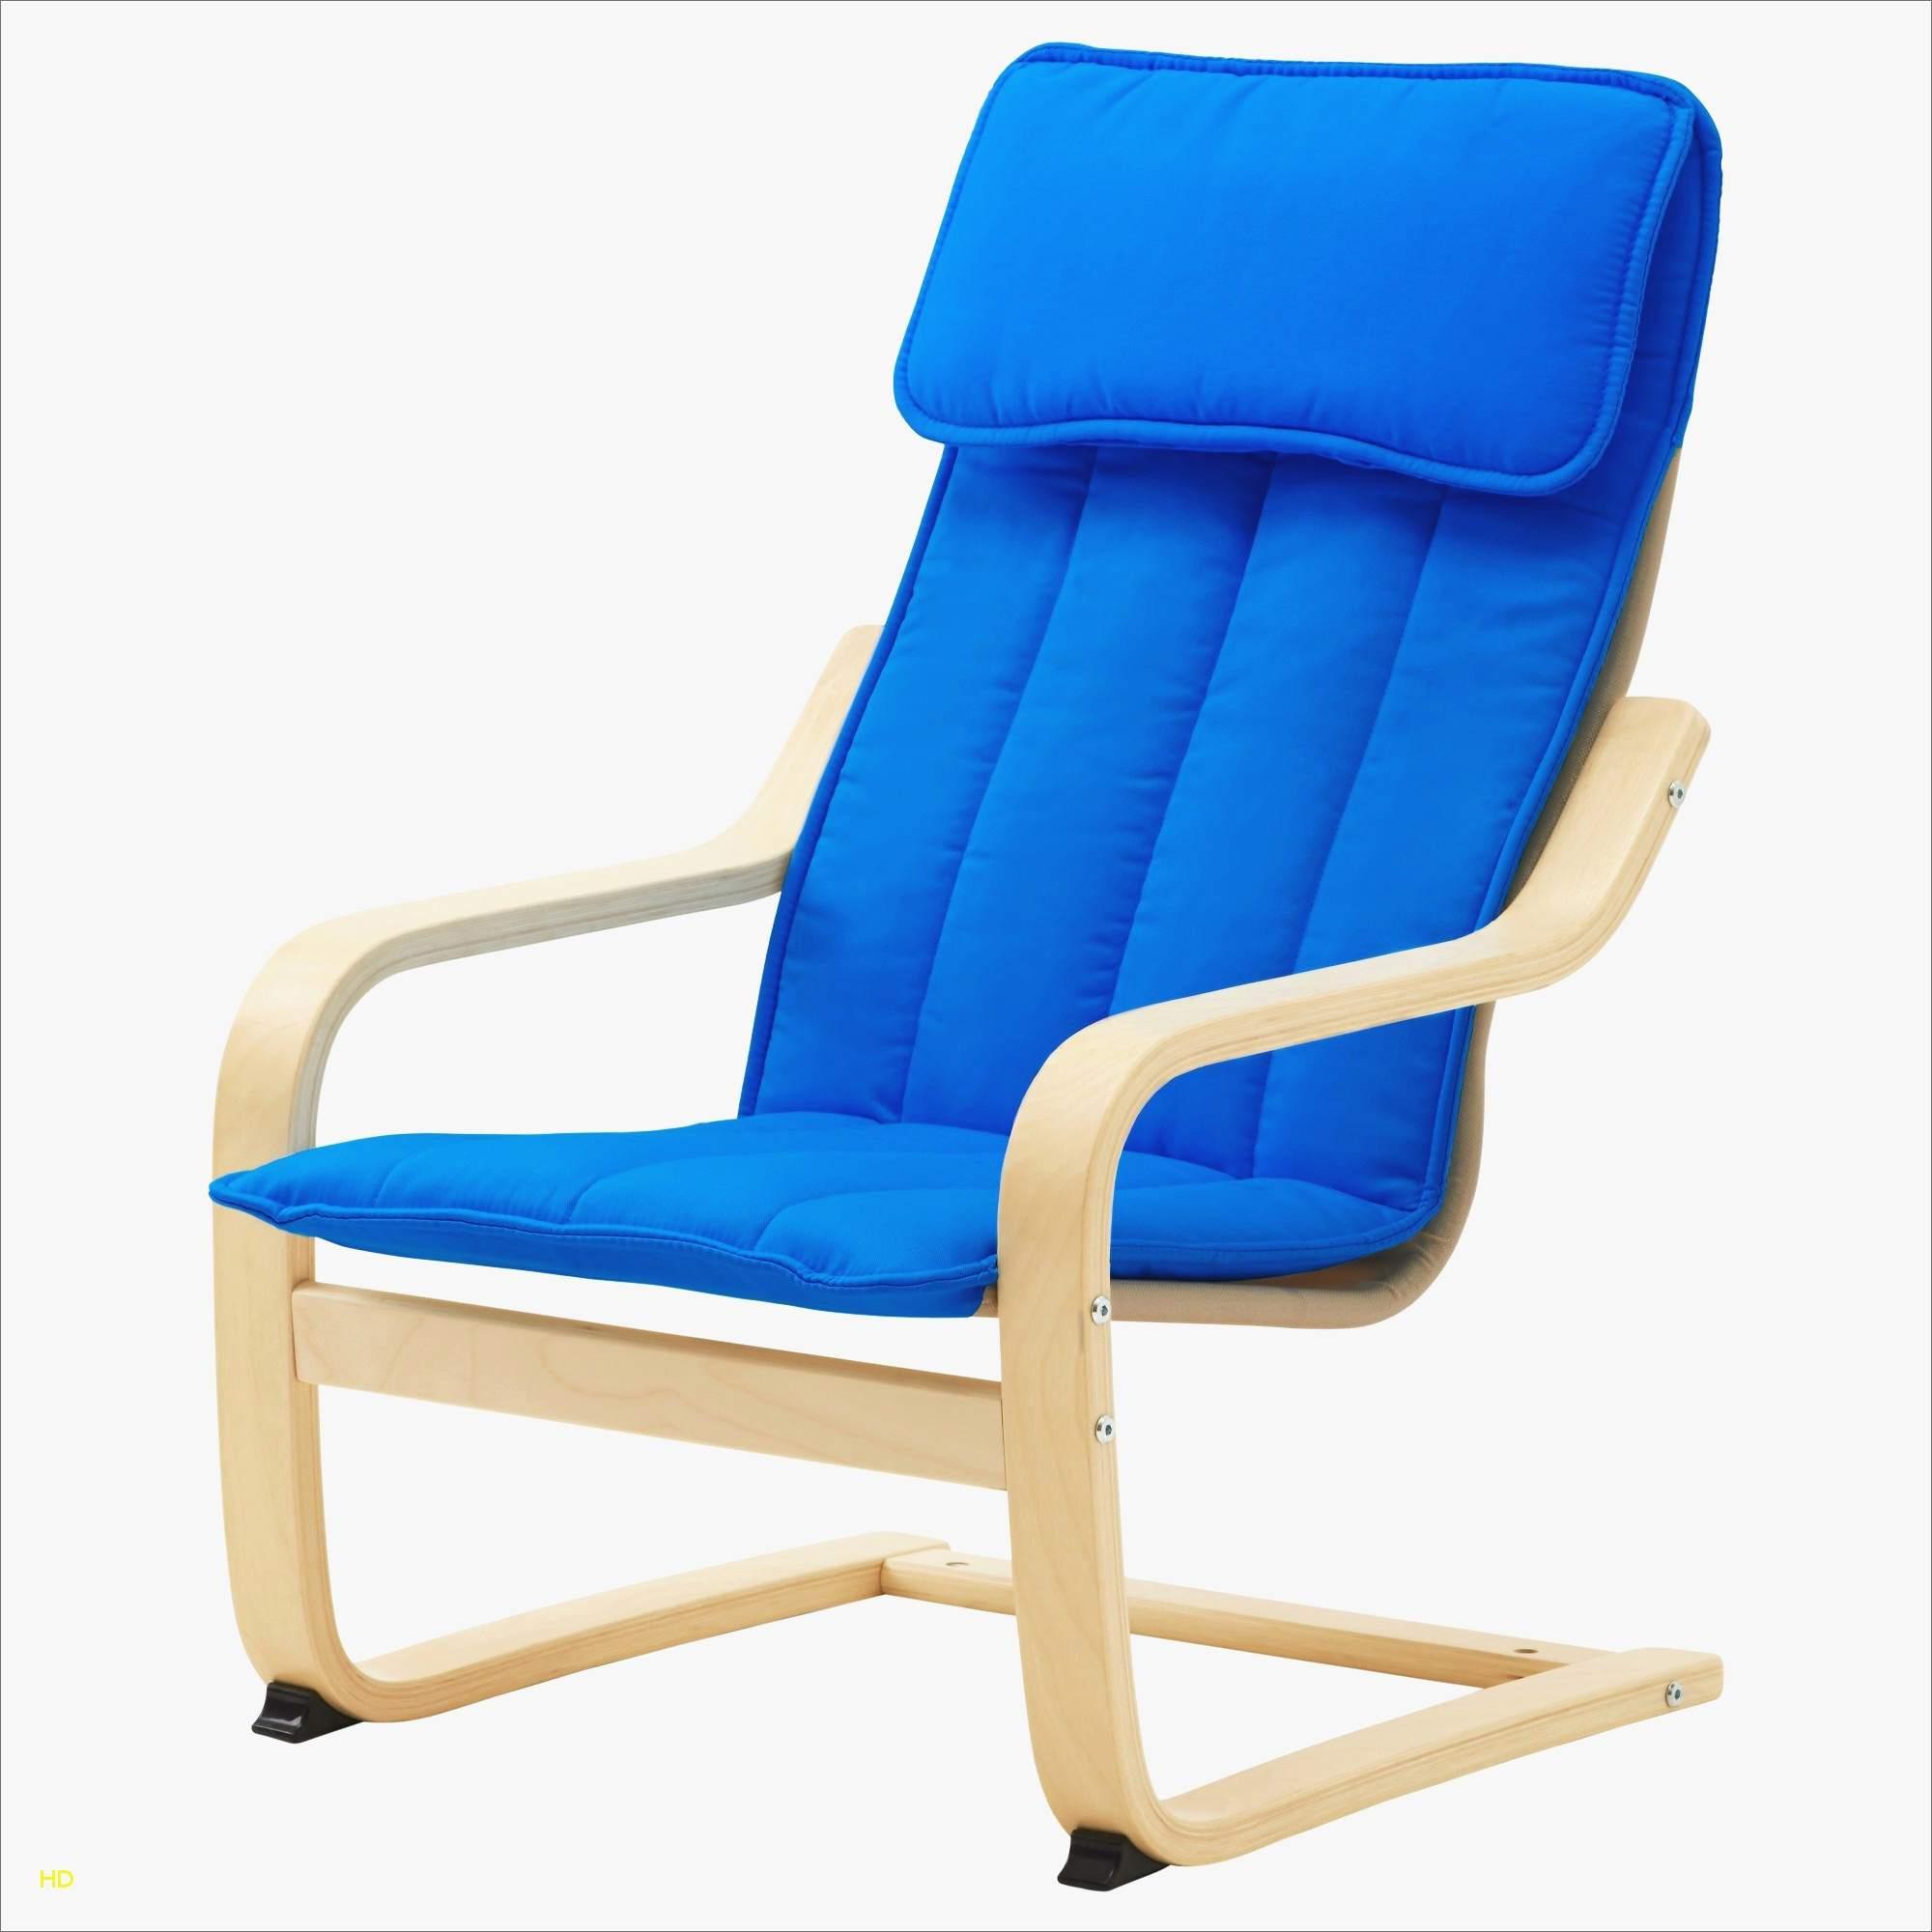 Escabeau Bois Ikea Impressionnant Photos Cuisine Bebe Gracieux Chaise Bois Ikea Frais Chaise Ikea Bebe Chaise